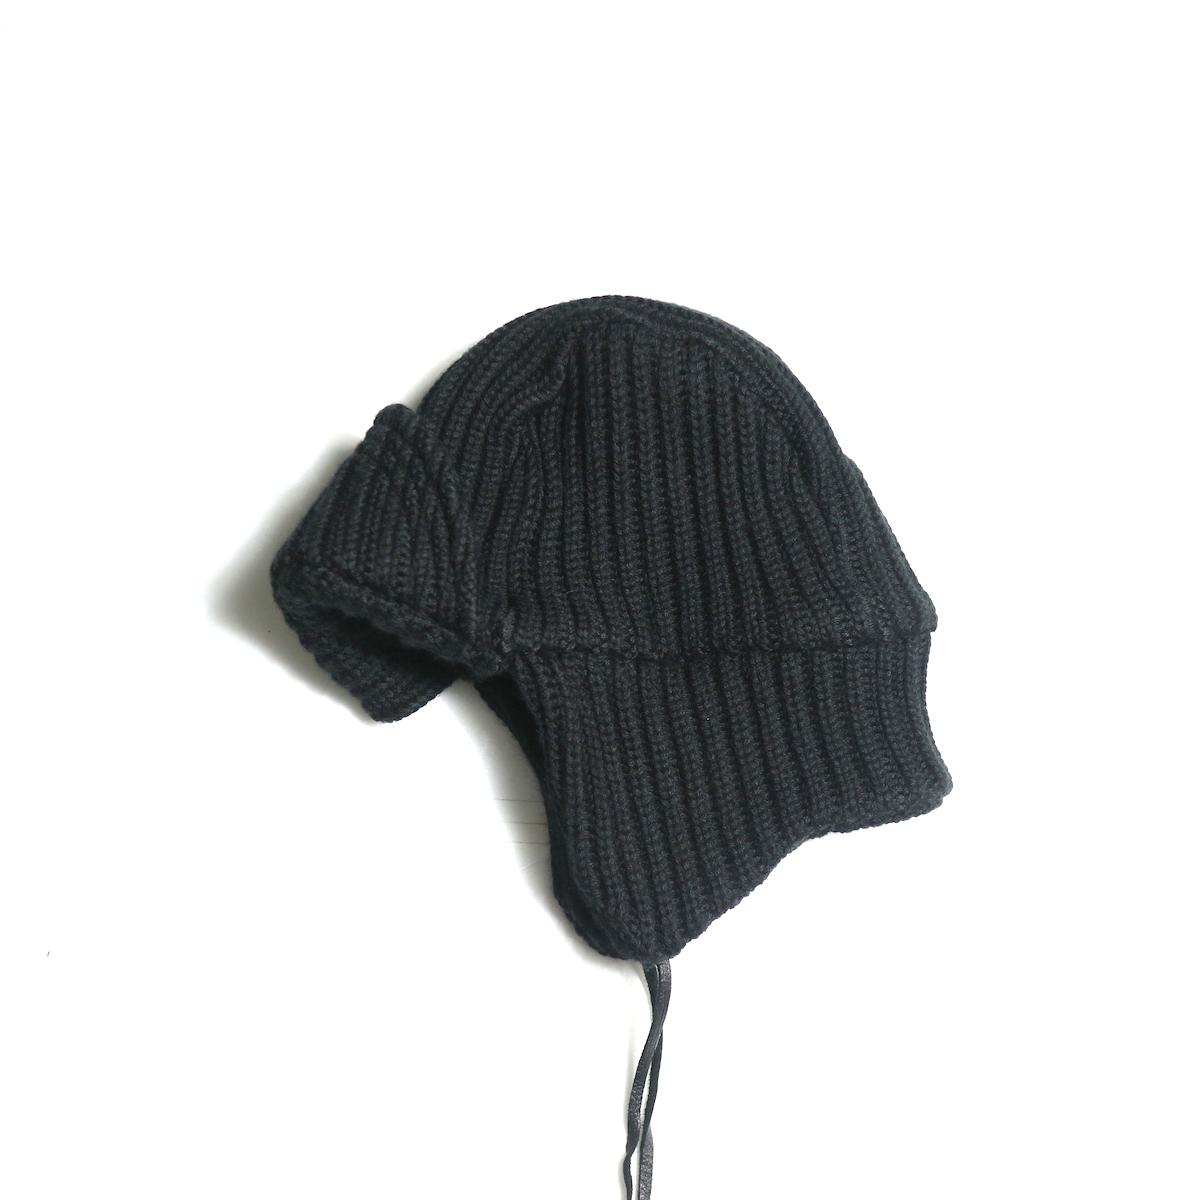 SOUTH2 WEST8 / Bomber Cap -W/A Knit